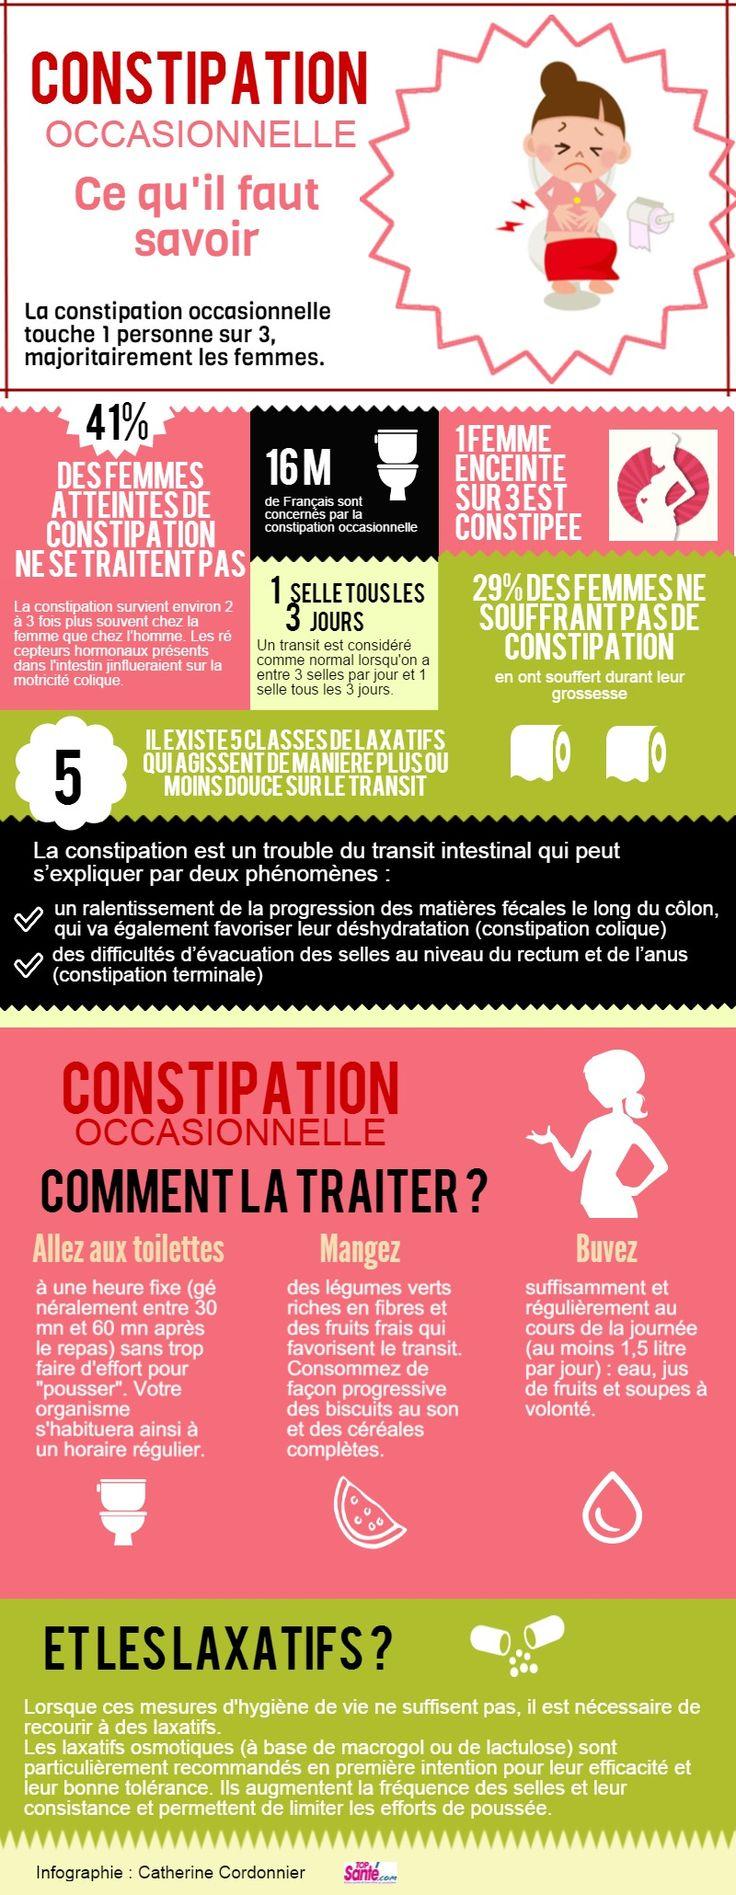 Constipation   Piktochart Infographic Editor